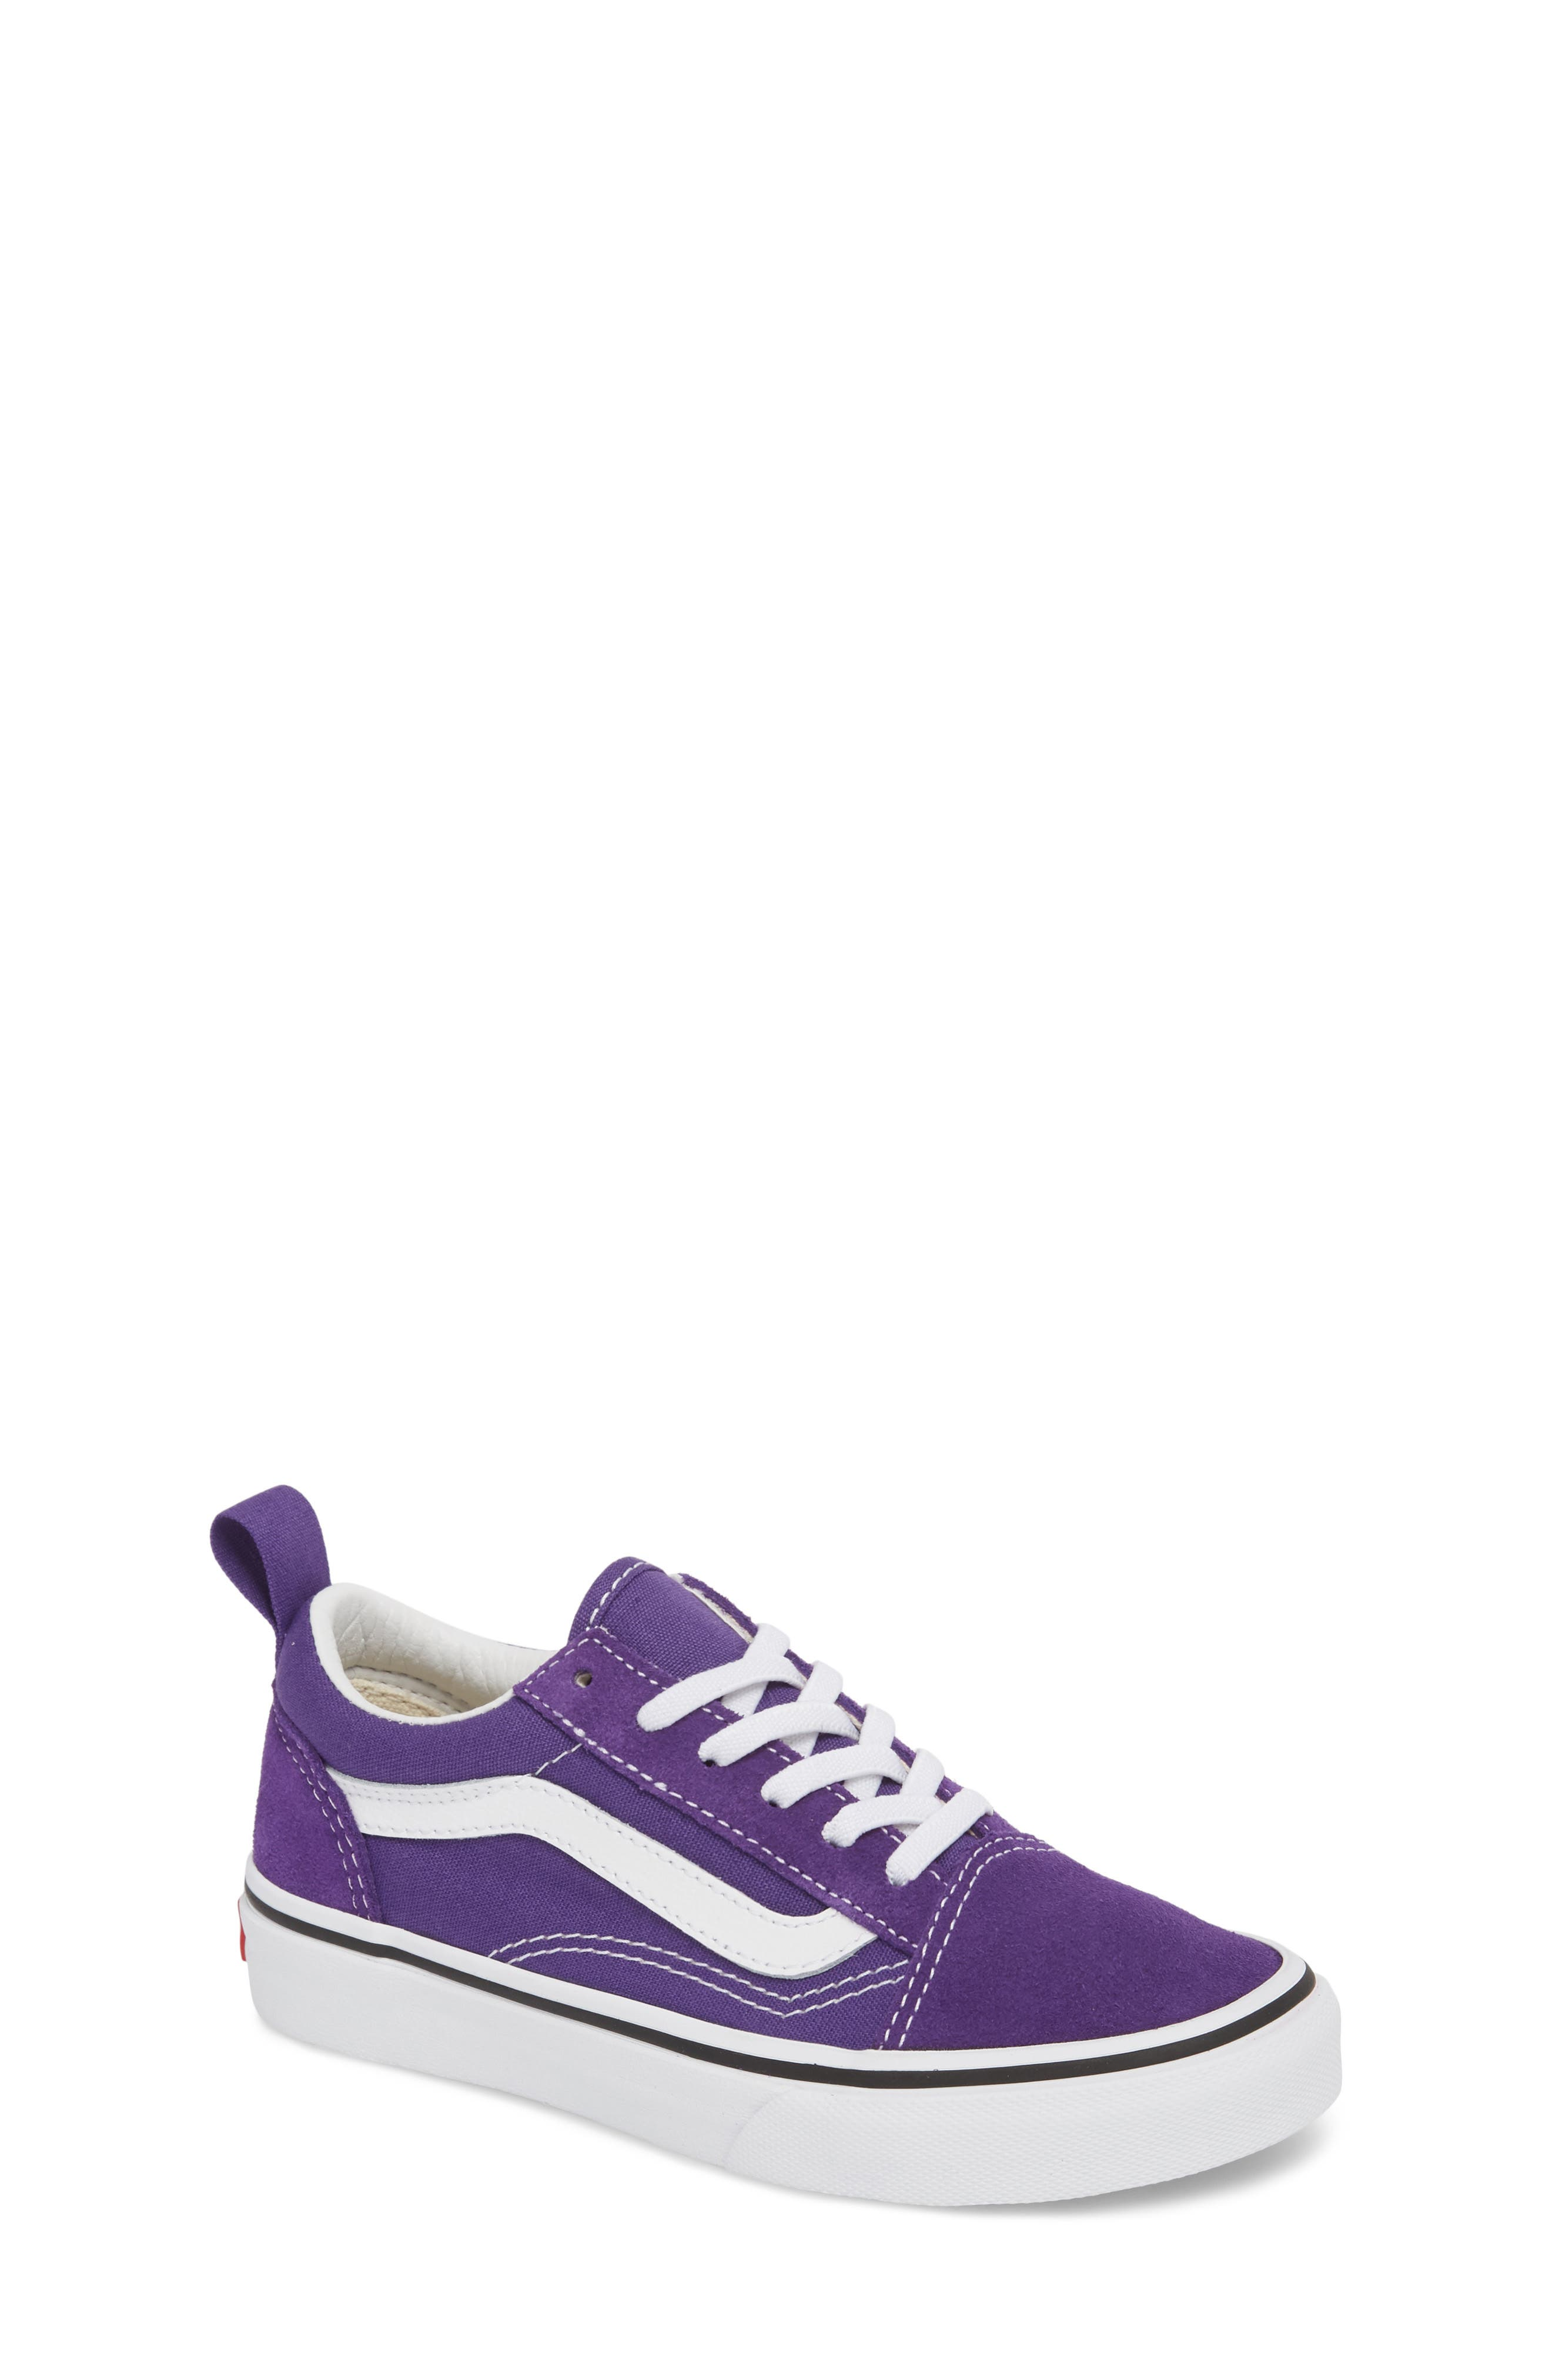 'Old Skool' Skate Sneaker,                         Main,                         color, HELIOTROPE/ WHITE